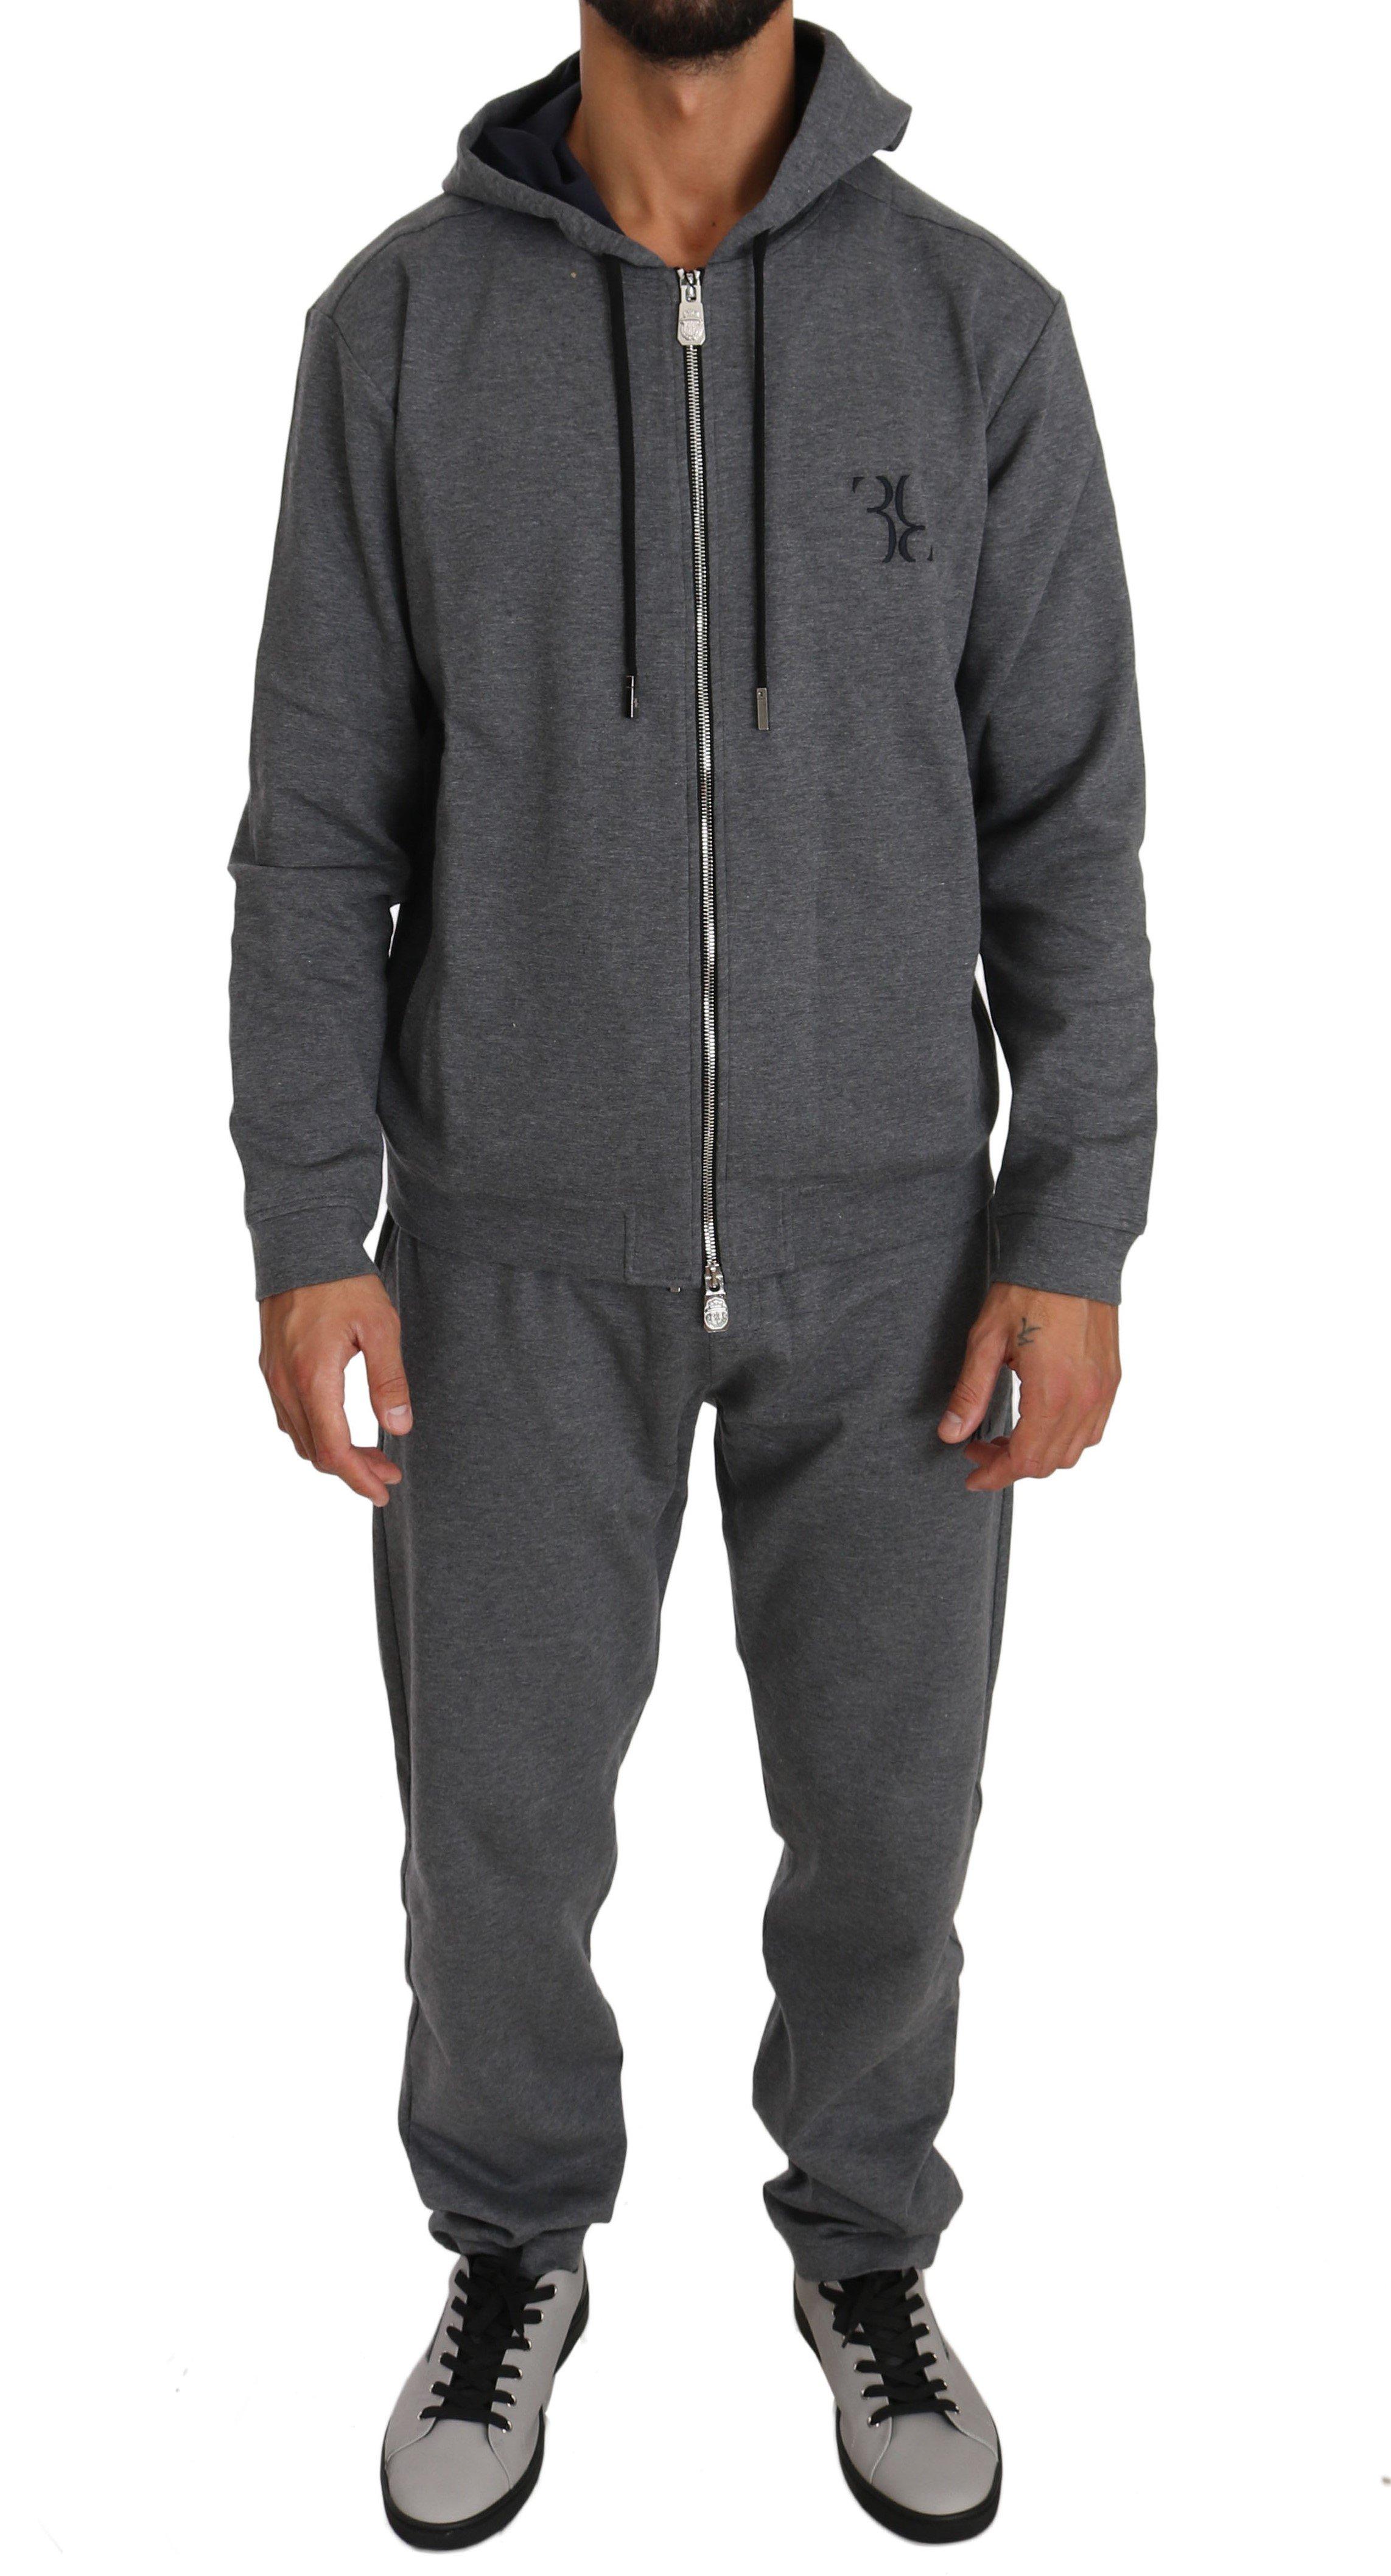 Billionaire Italian Couture Men's Hoodie Tracksuit Grey BIL1012 - L